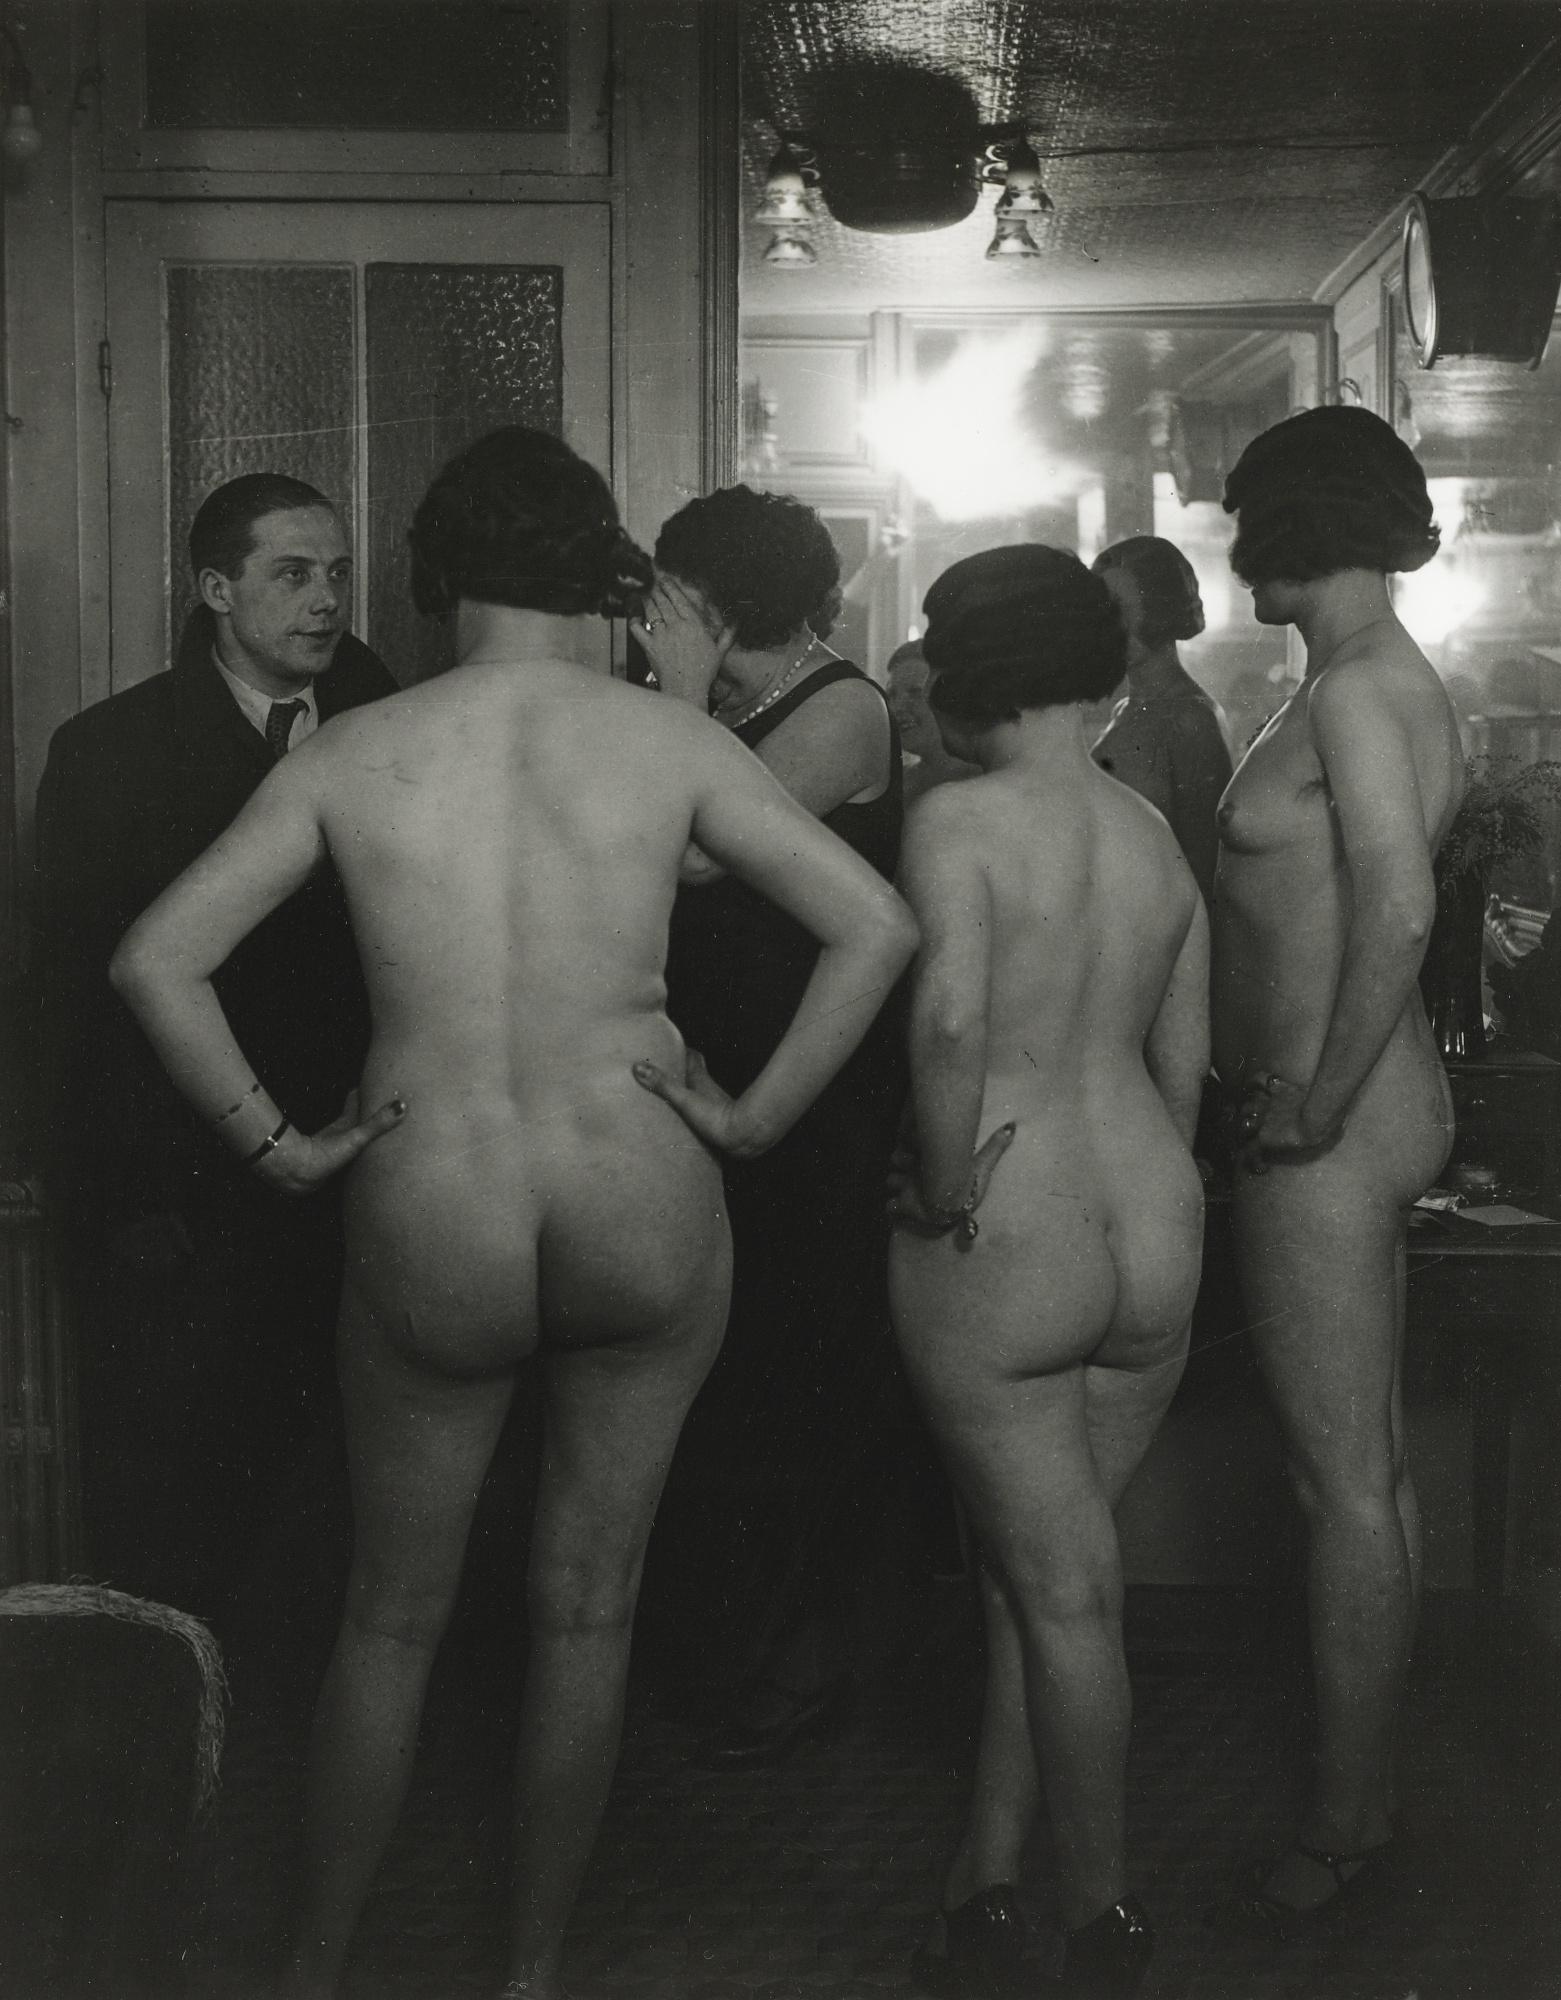 Brassai-Chez Suzy La Presentation' Vers-1932